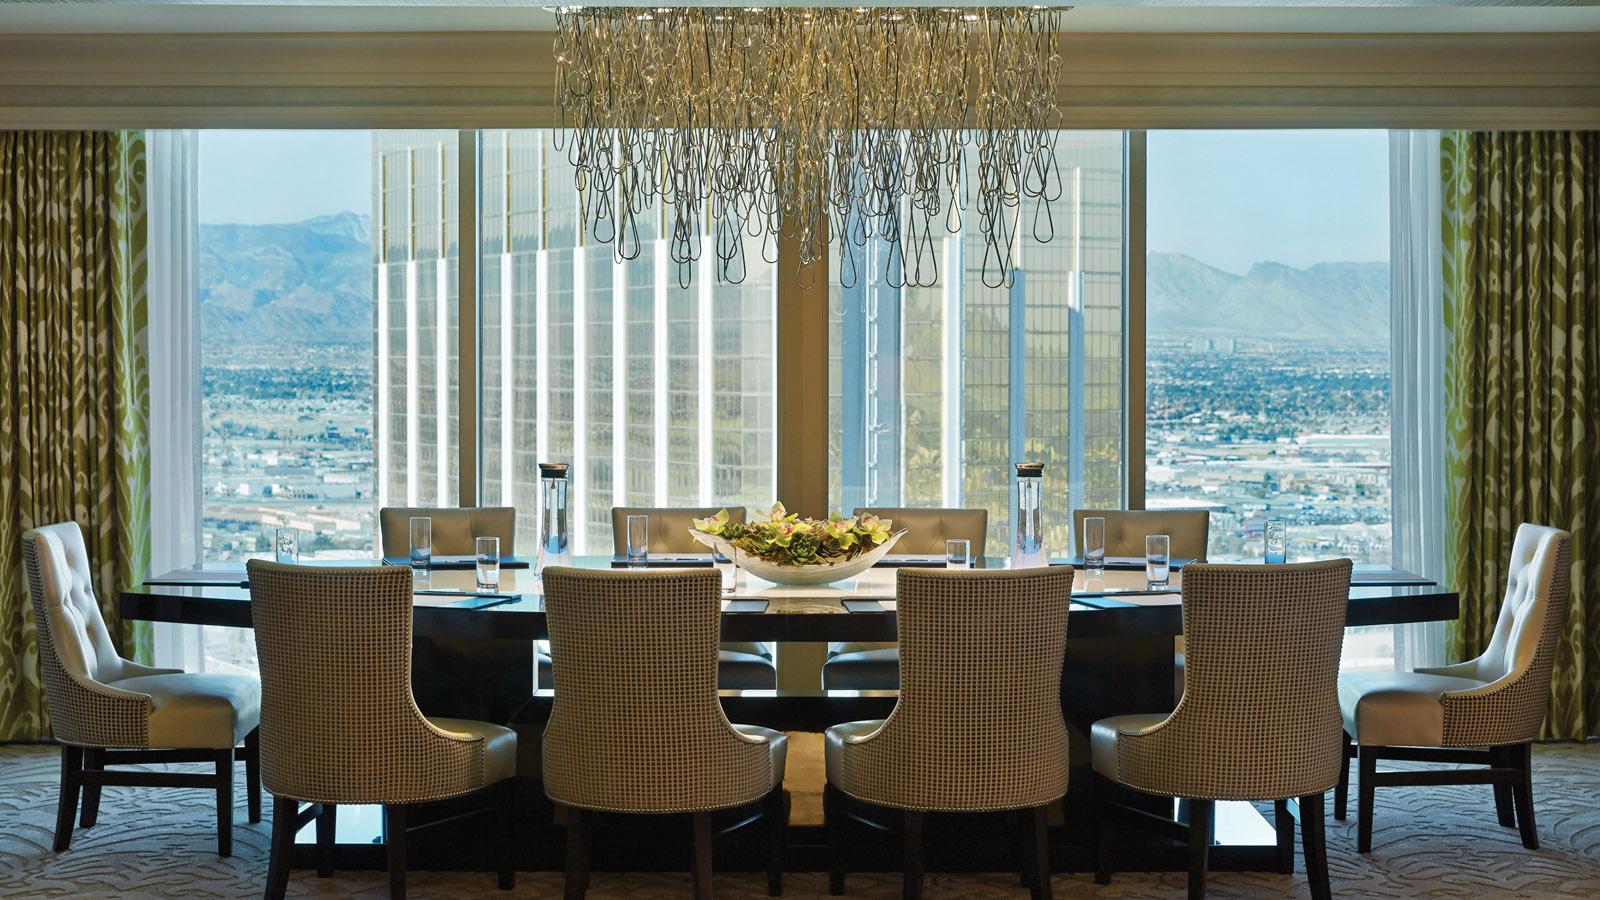 Las Vegas Hotel Meeting Space | Event Venue | Four Seasons Hotel